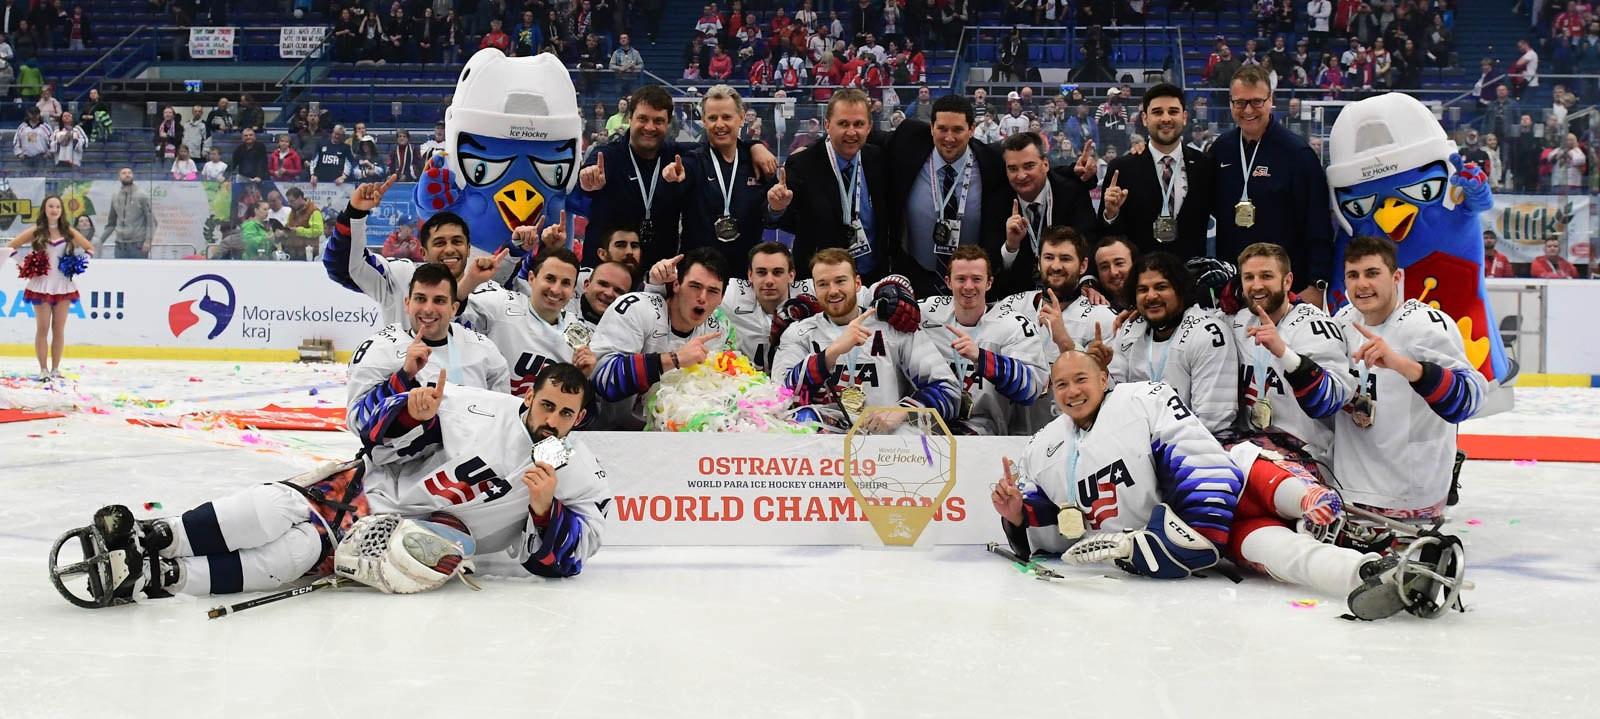 The United States won last year's World Para Ice Hockey Championships A-Pool in Ostrava ©World Para Ice Hockey